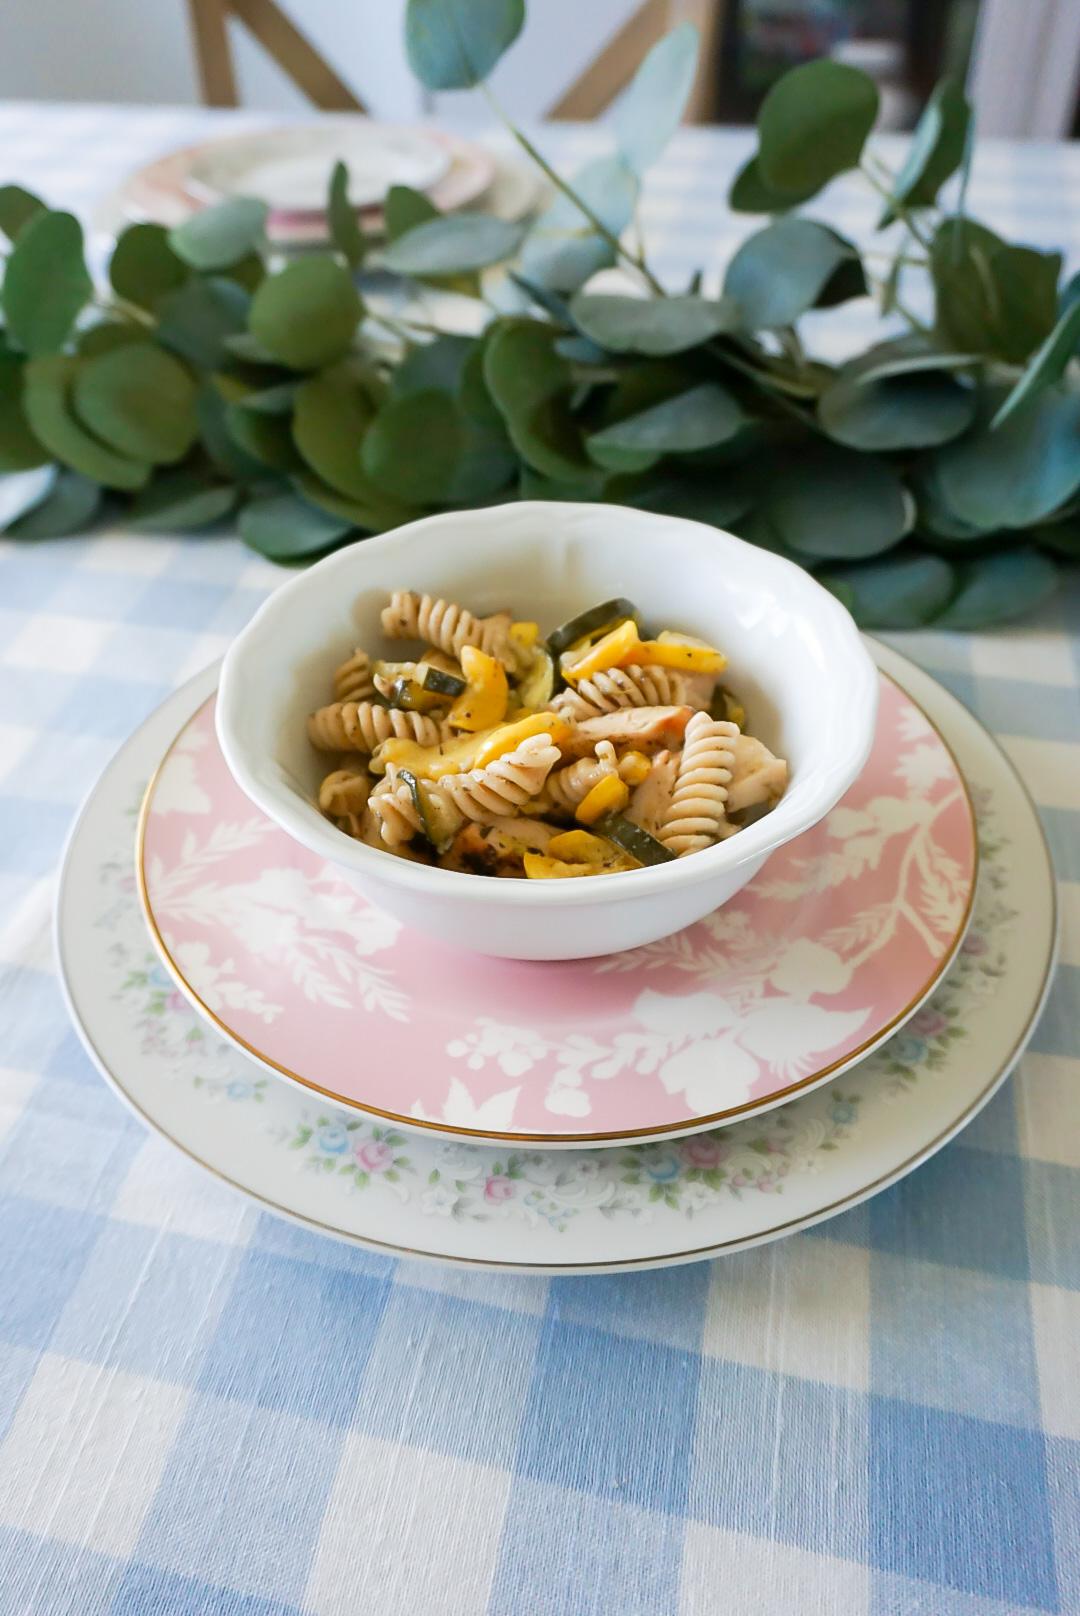 allergen-free pasta, allergen-free pasta recipe, dairy-free pasta, healthy Italian pasta recipe, light spring pasta recipe, garden vegetable pasta recipe